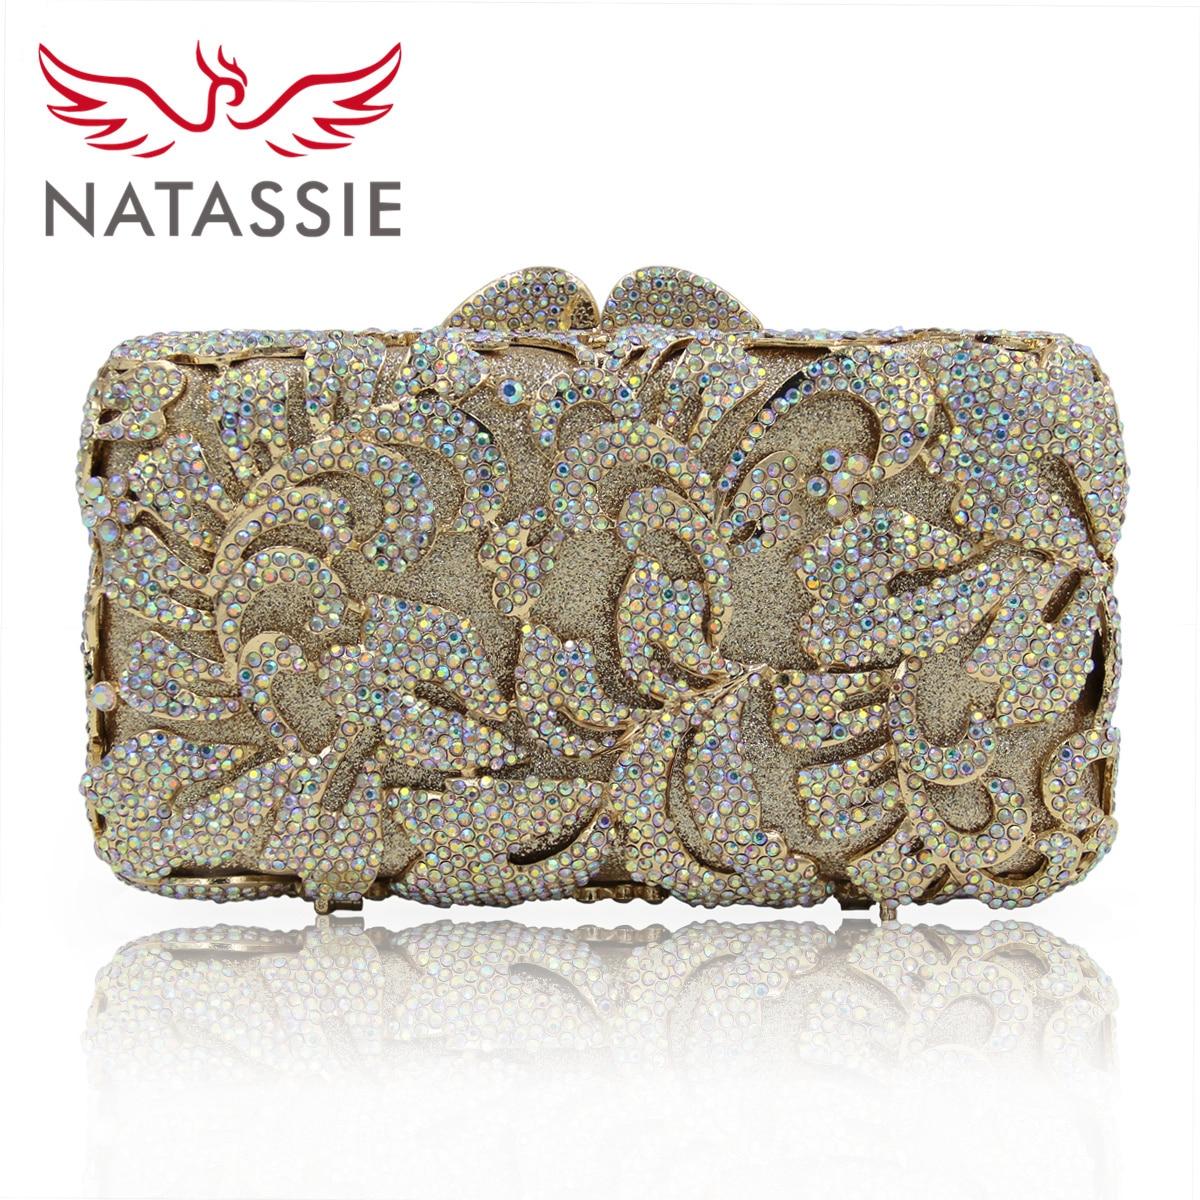 ФОТО NATASSIE Women Evening Bag New Spring Flower Crystal Clutch Female Day Clutches Ladies Gold Diamond Wedding Purses